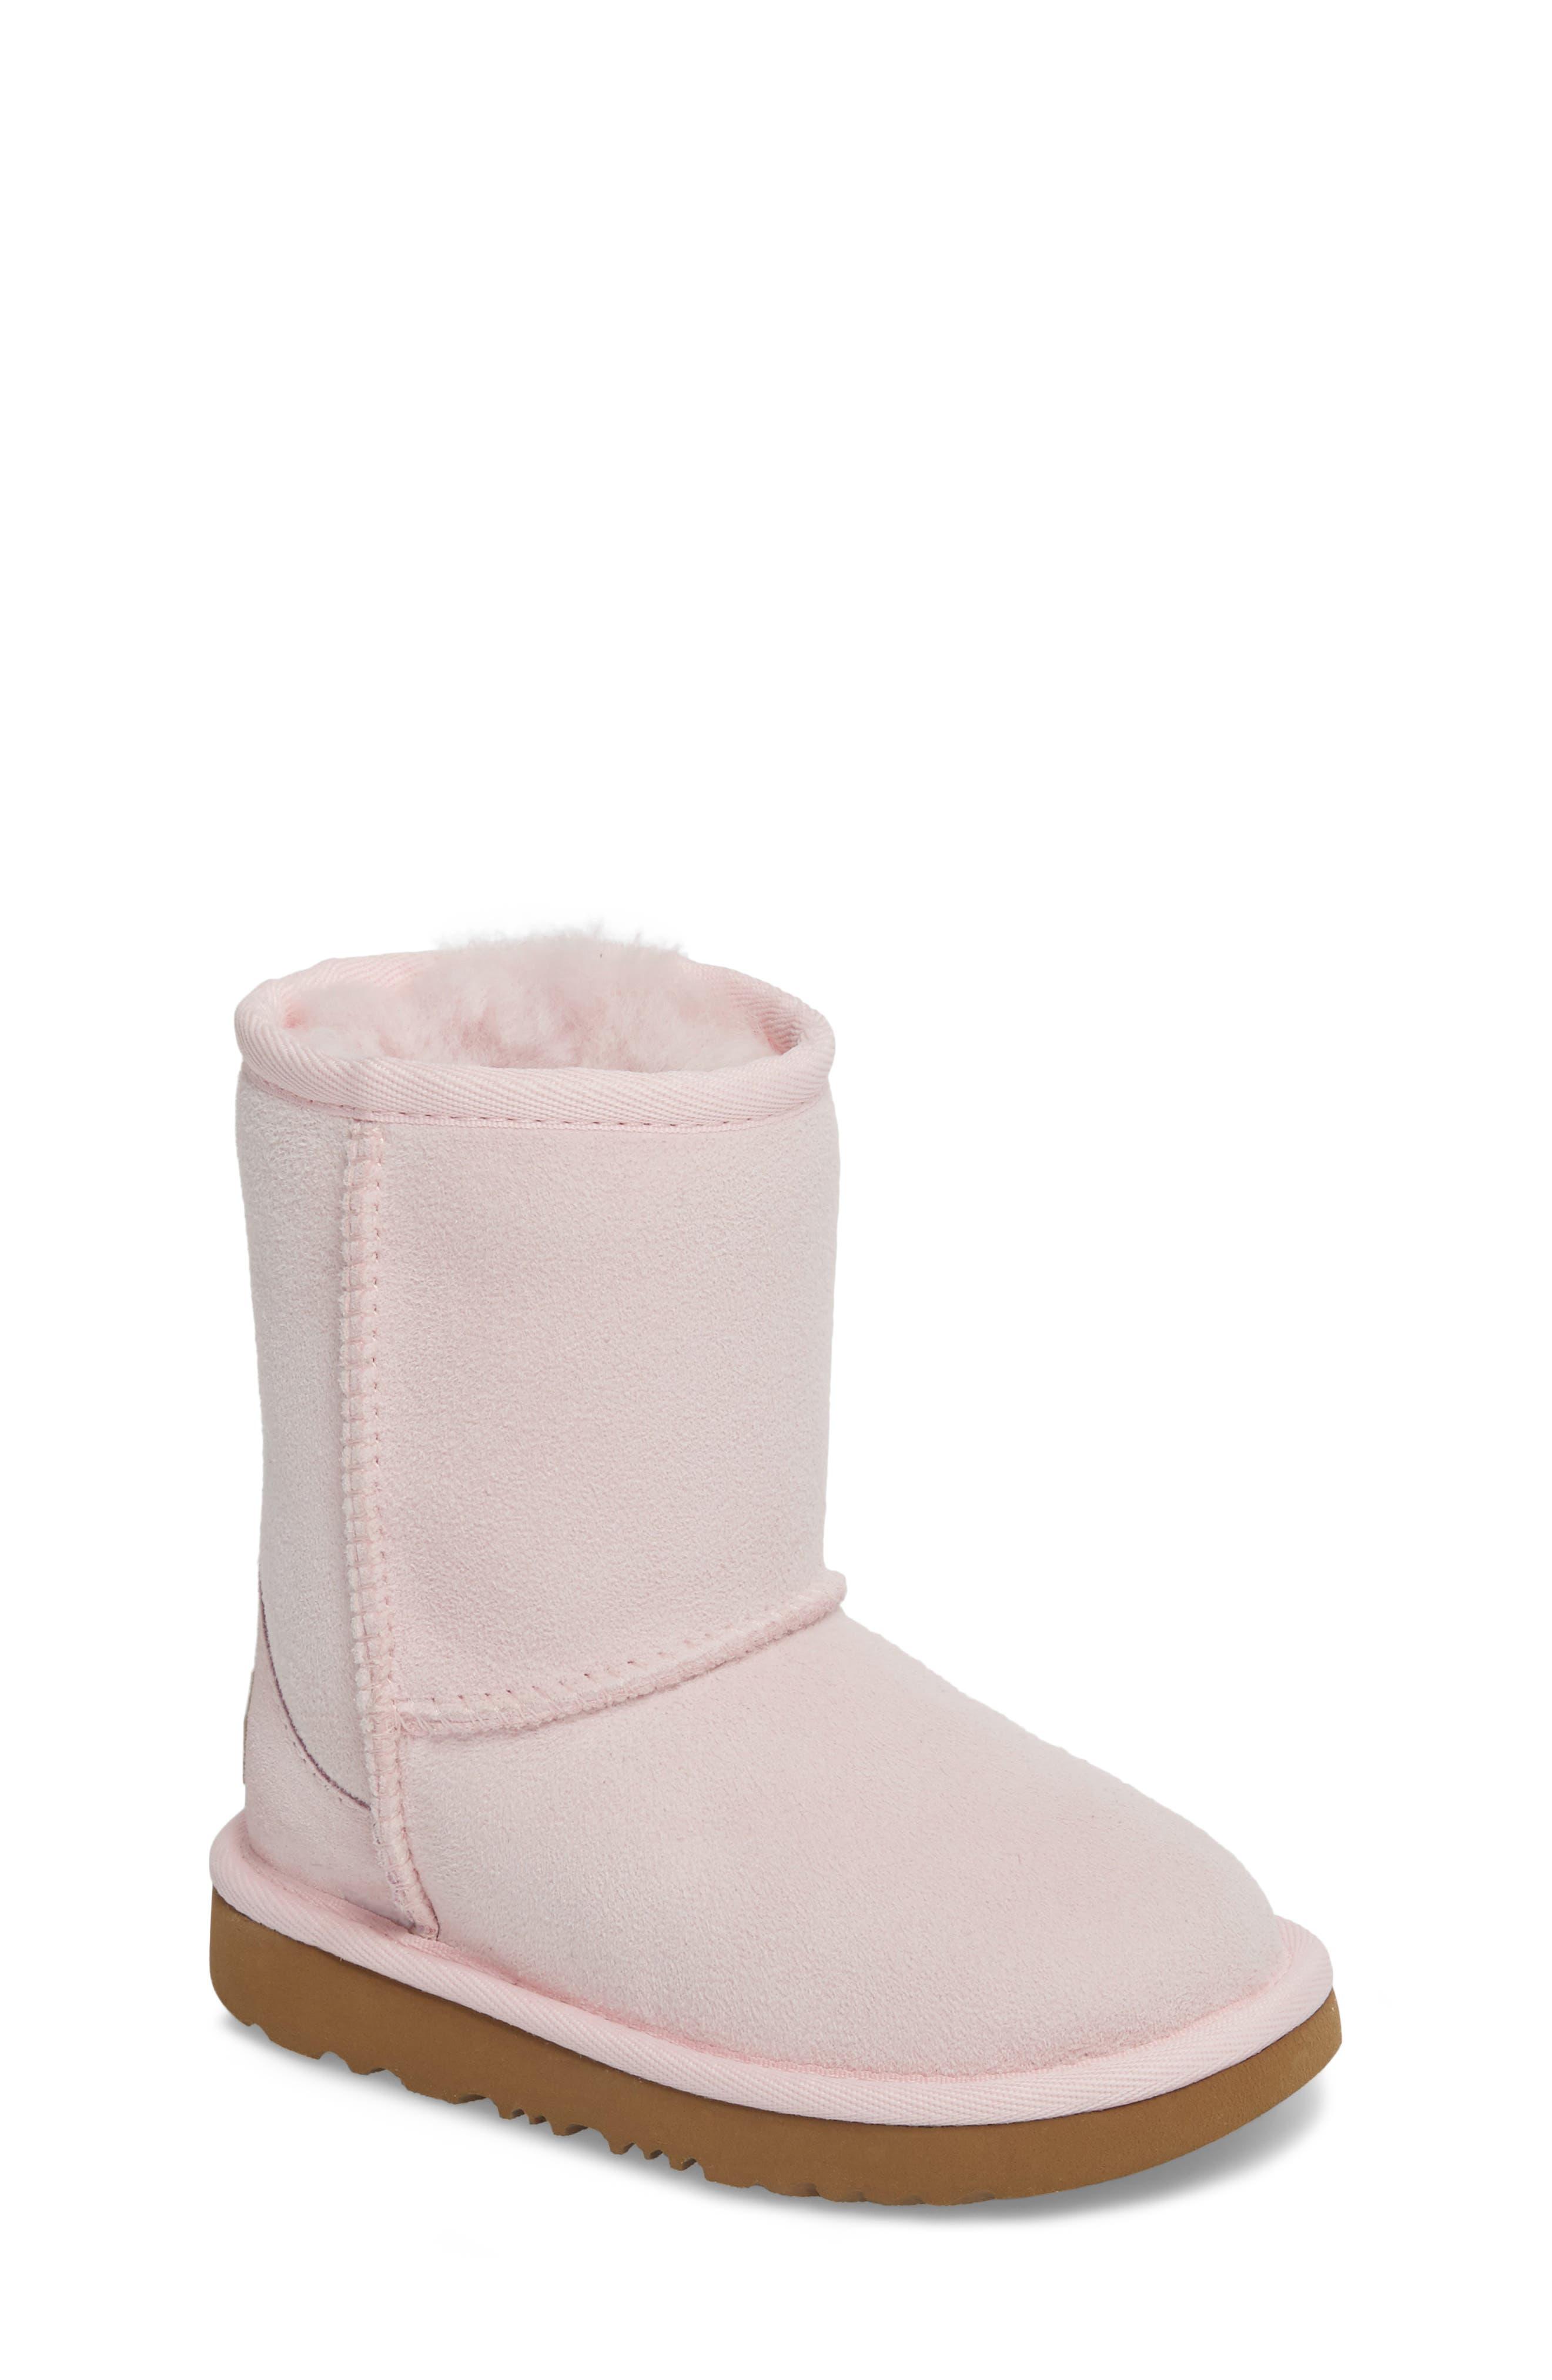 Main Image - UGG® Classic II Water Resistant Genuine Shearling Boot (Walker, Toddler, Little Kid & Big Kid)